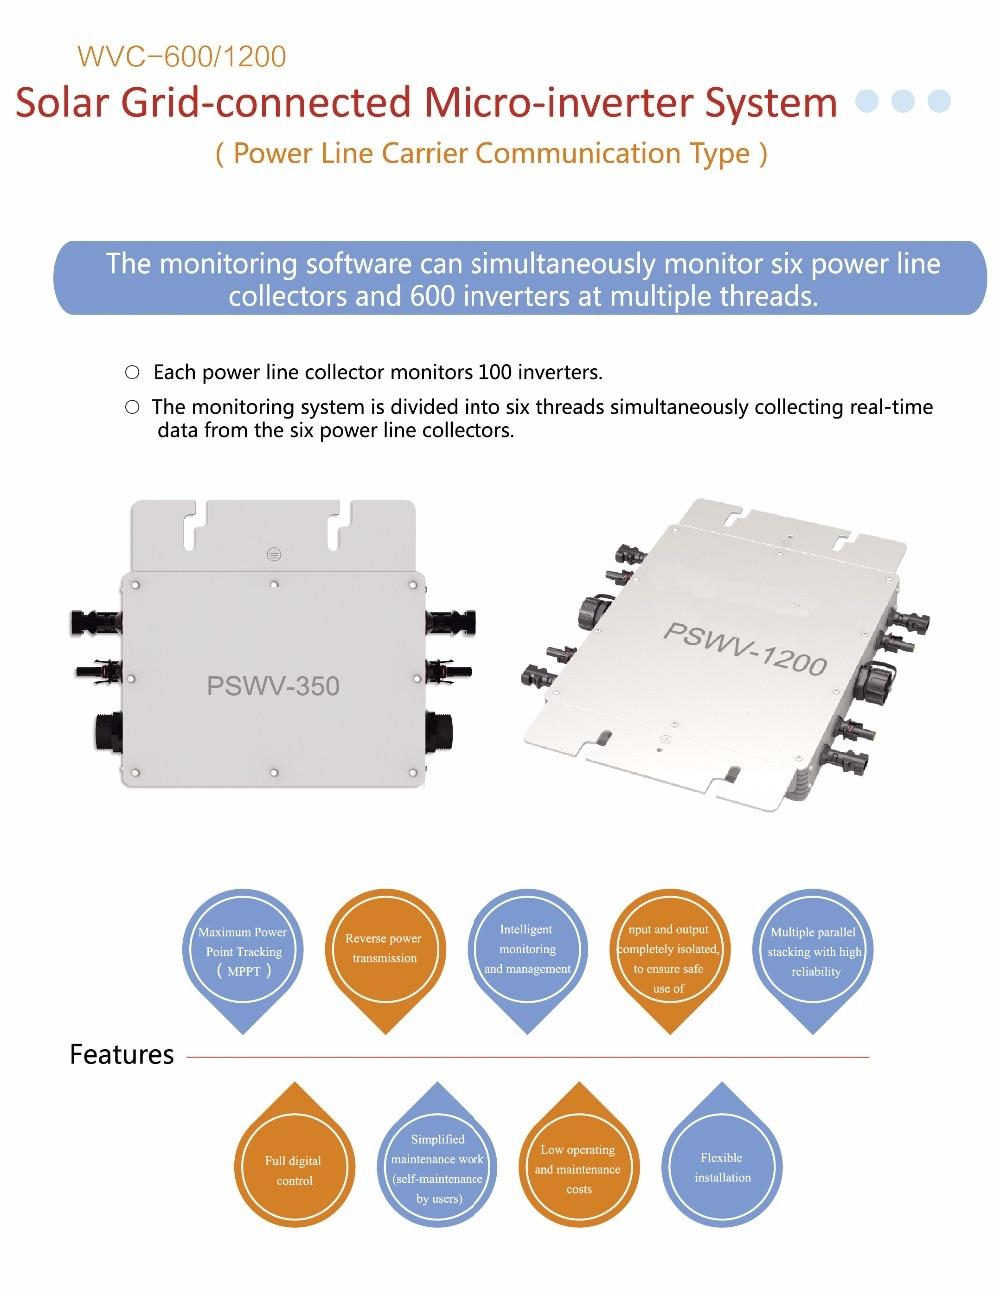 1200W 120V/230V AC MPPT Waterproof IP65 Grid Tie Solar Power Micro Inverter maylar 22 60vdc 300w dc to ac solar grid tie power inverter output 90 260vac 50hz 60hz